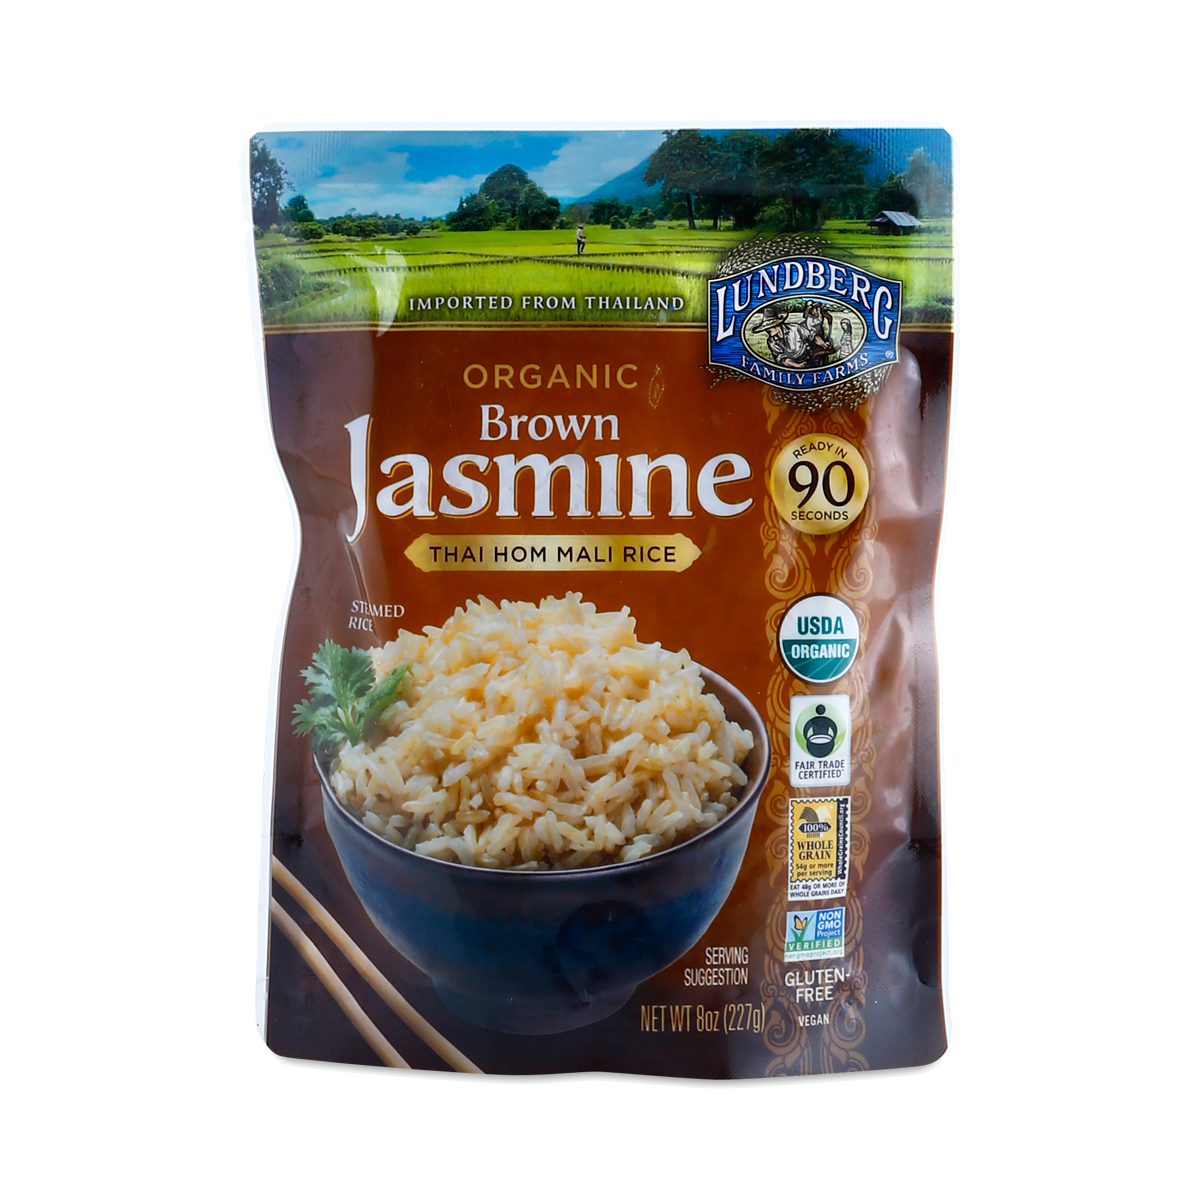 Organic Brown Jasmine Rice by Lundberg Farms - Thrive Market